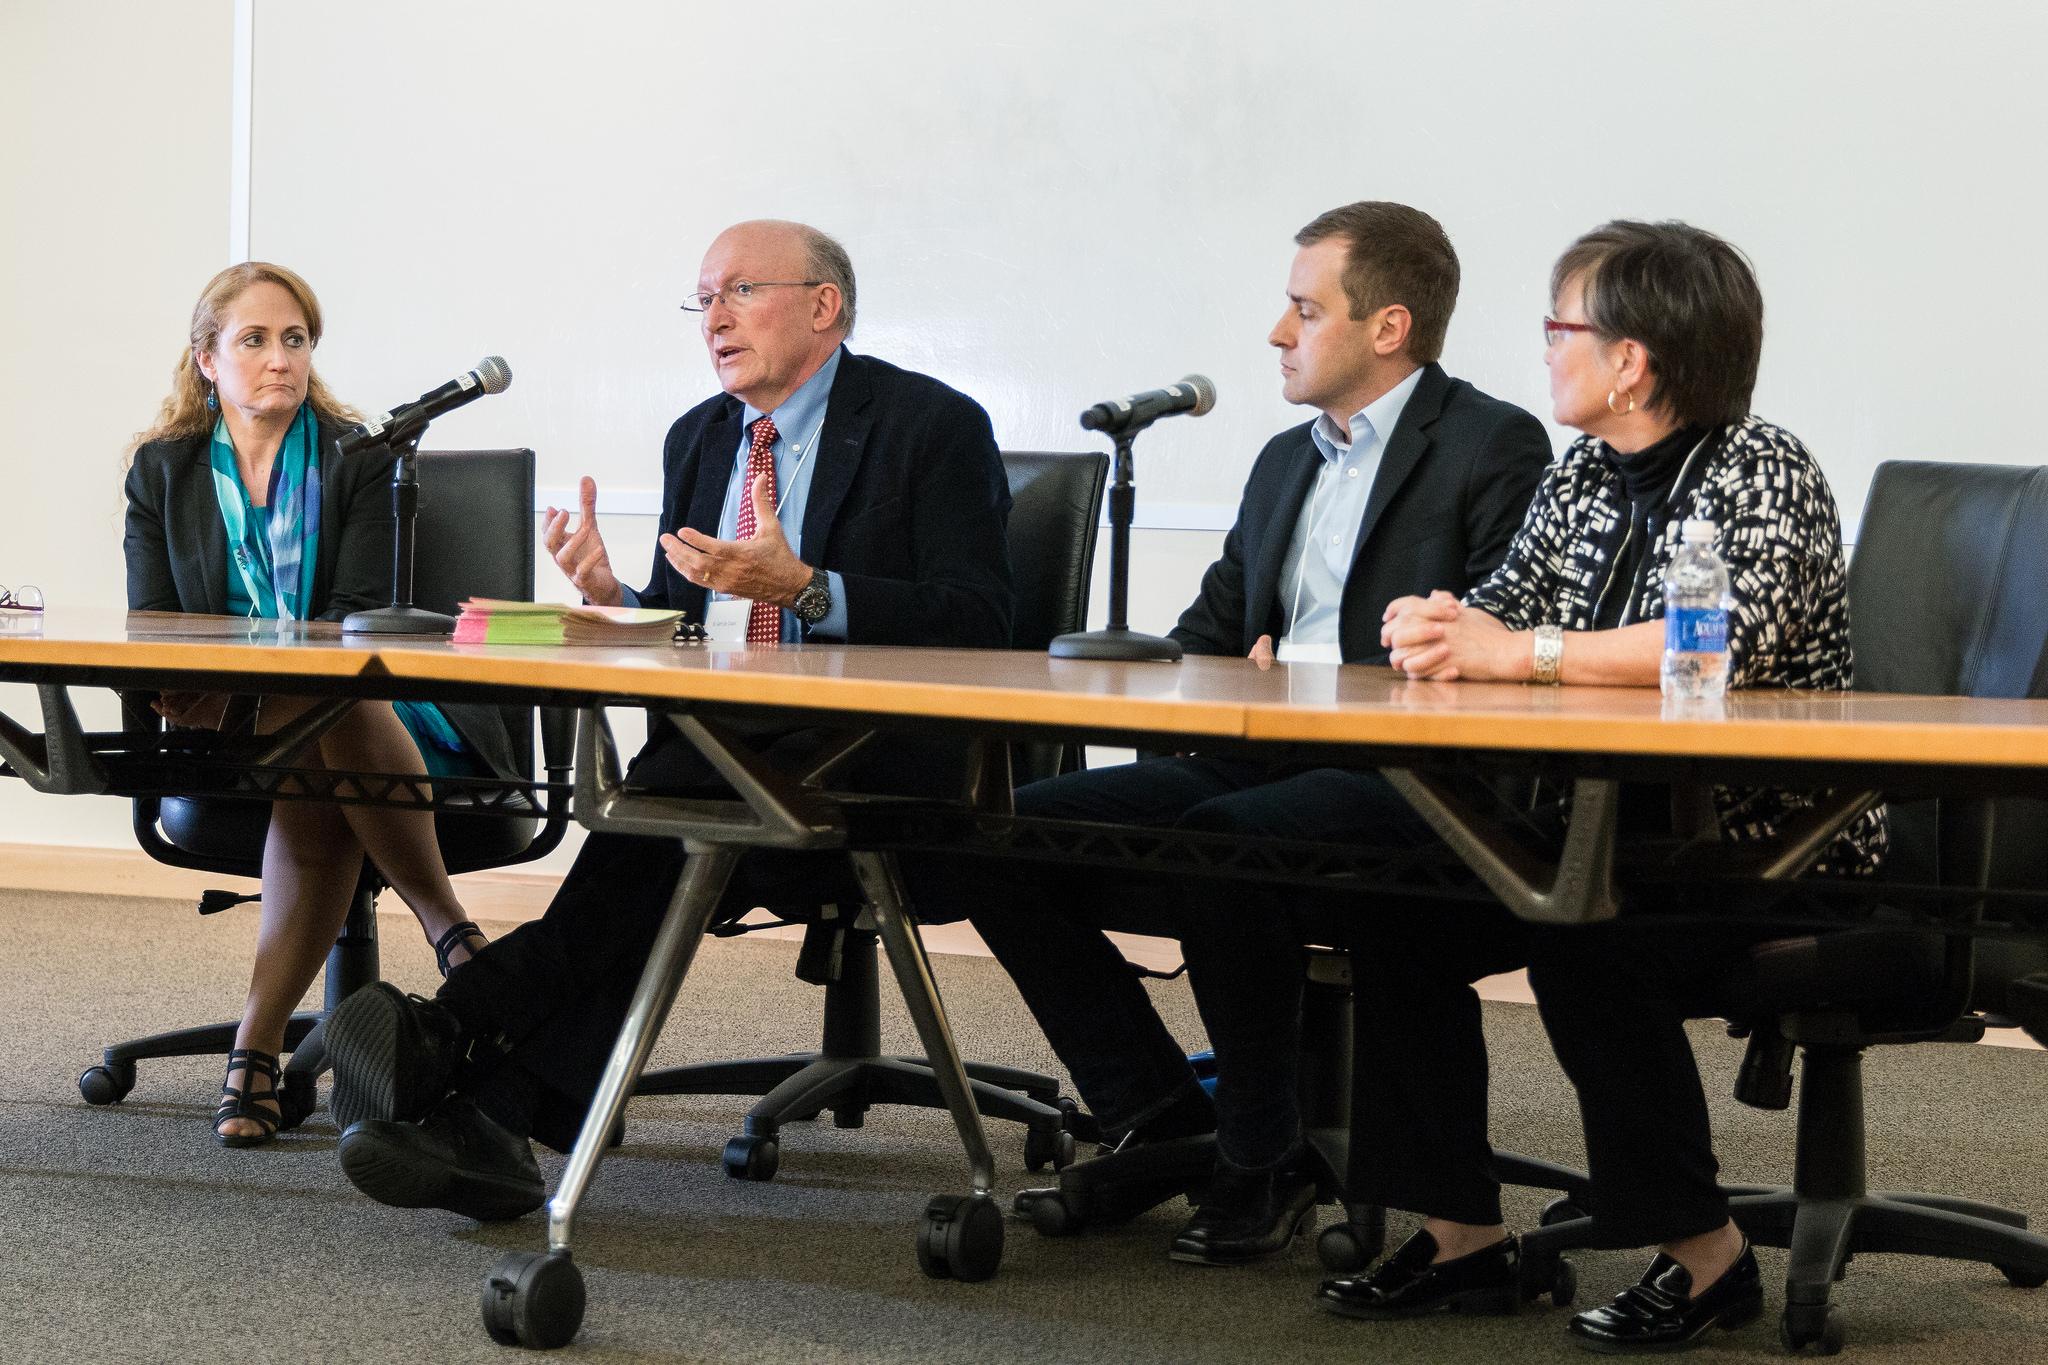 Photo of four panelists